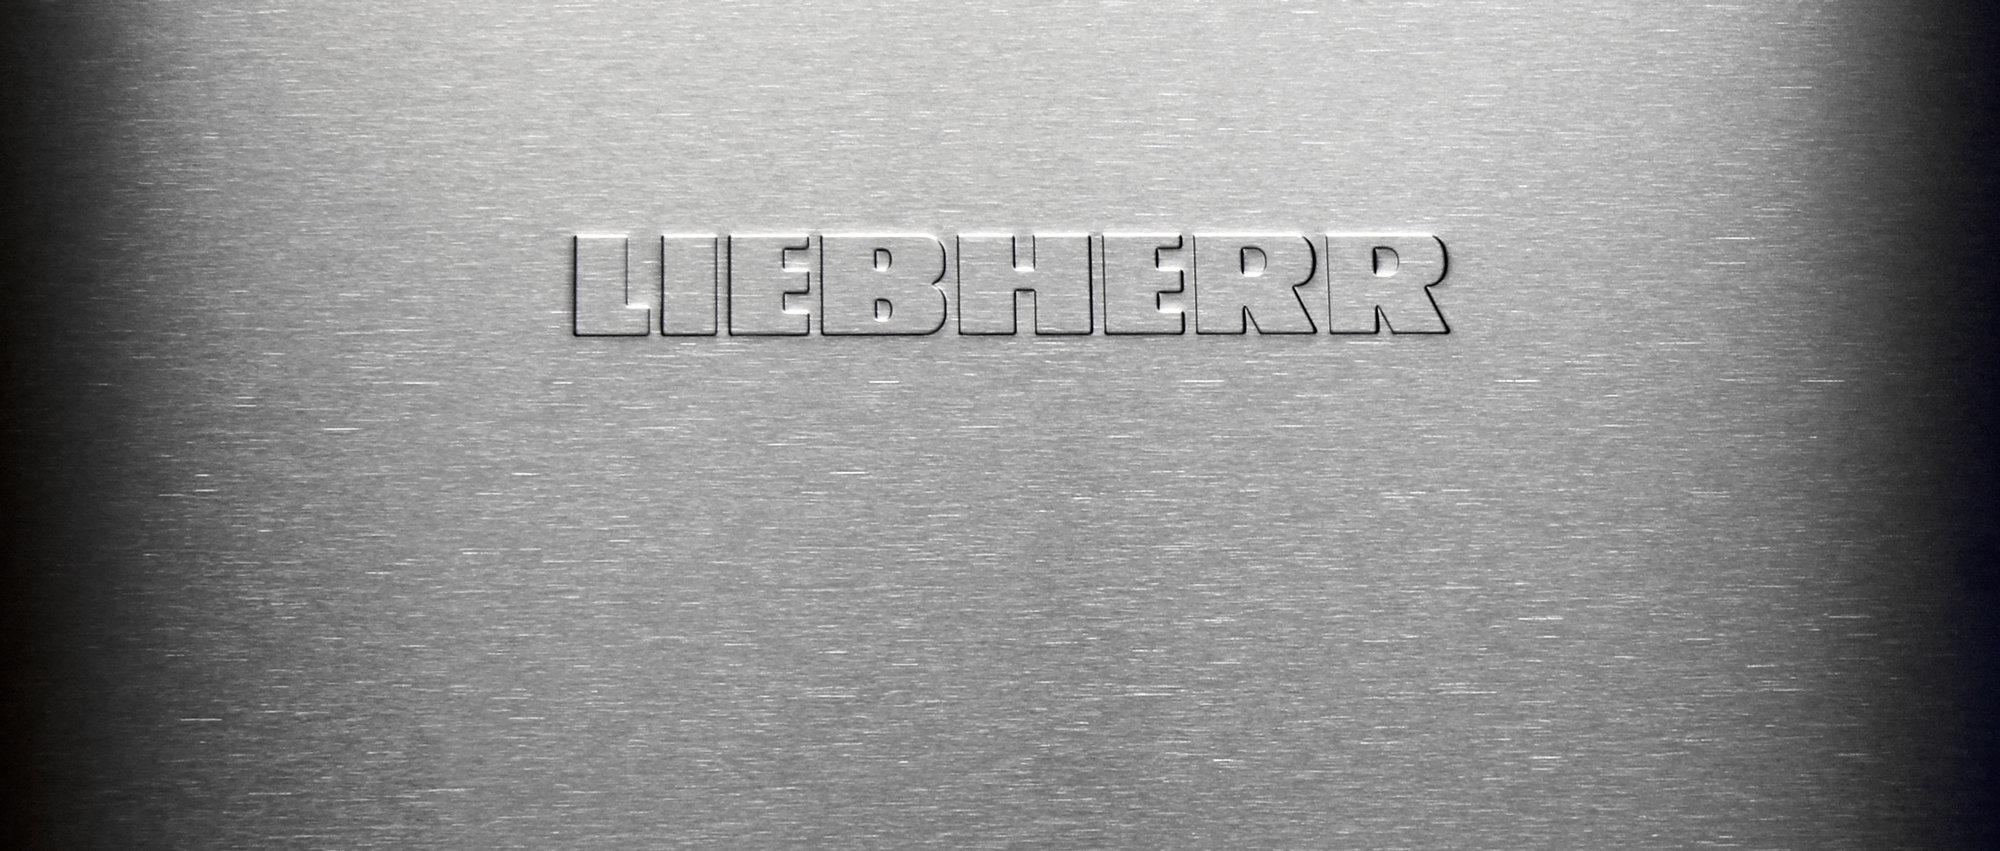 Liebherr CS1360 Compact Bottom Freezer Refrigerator